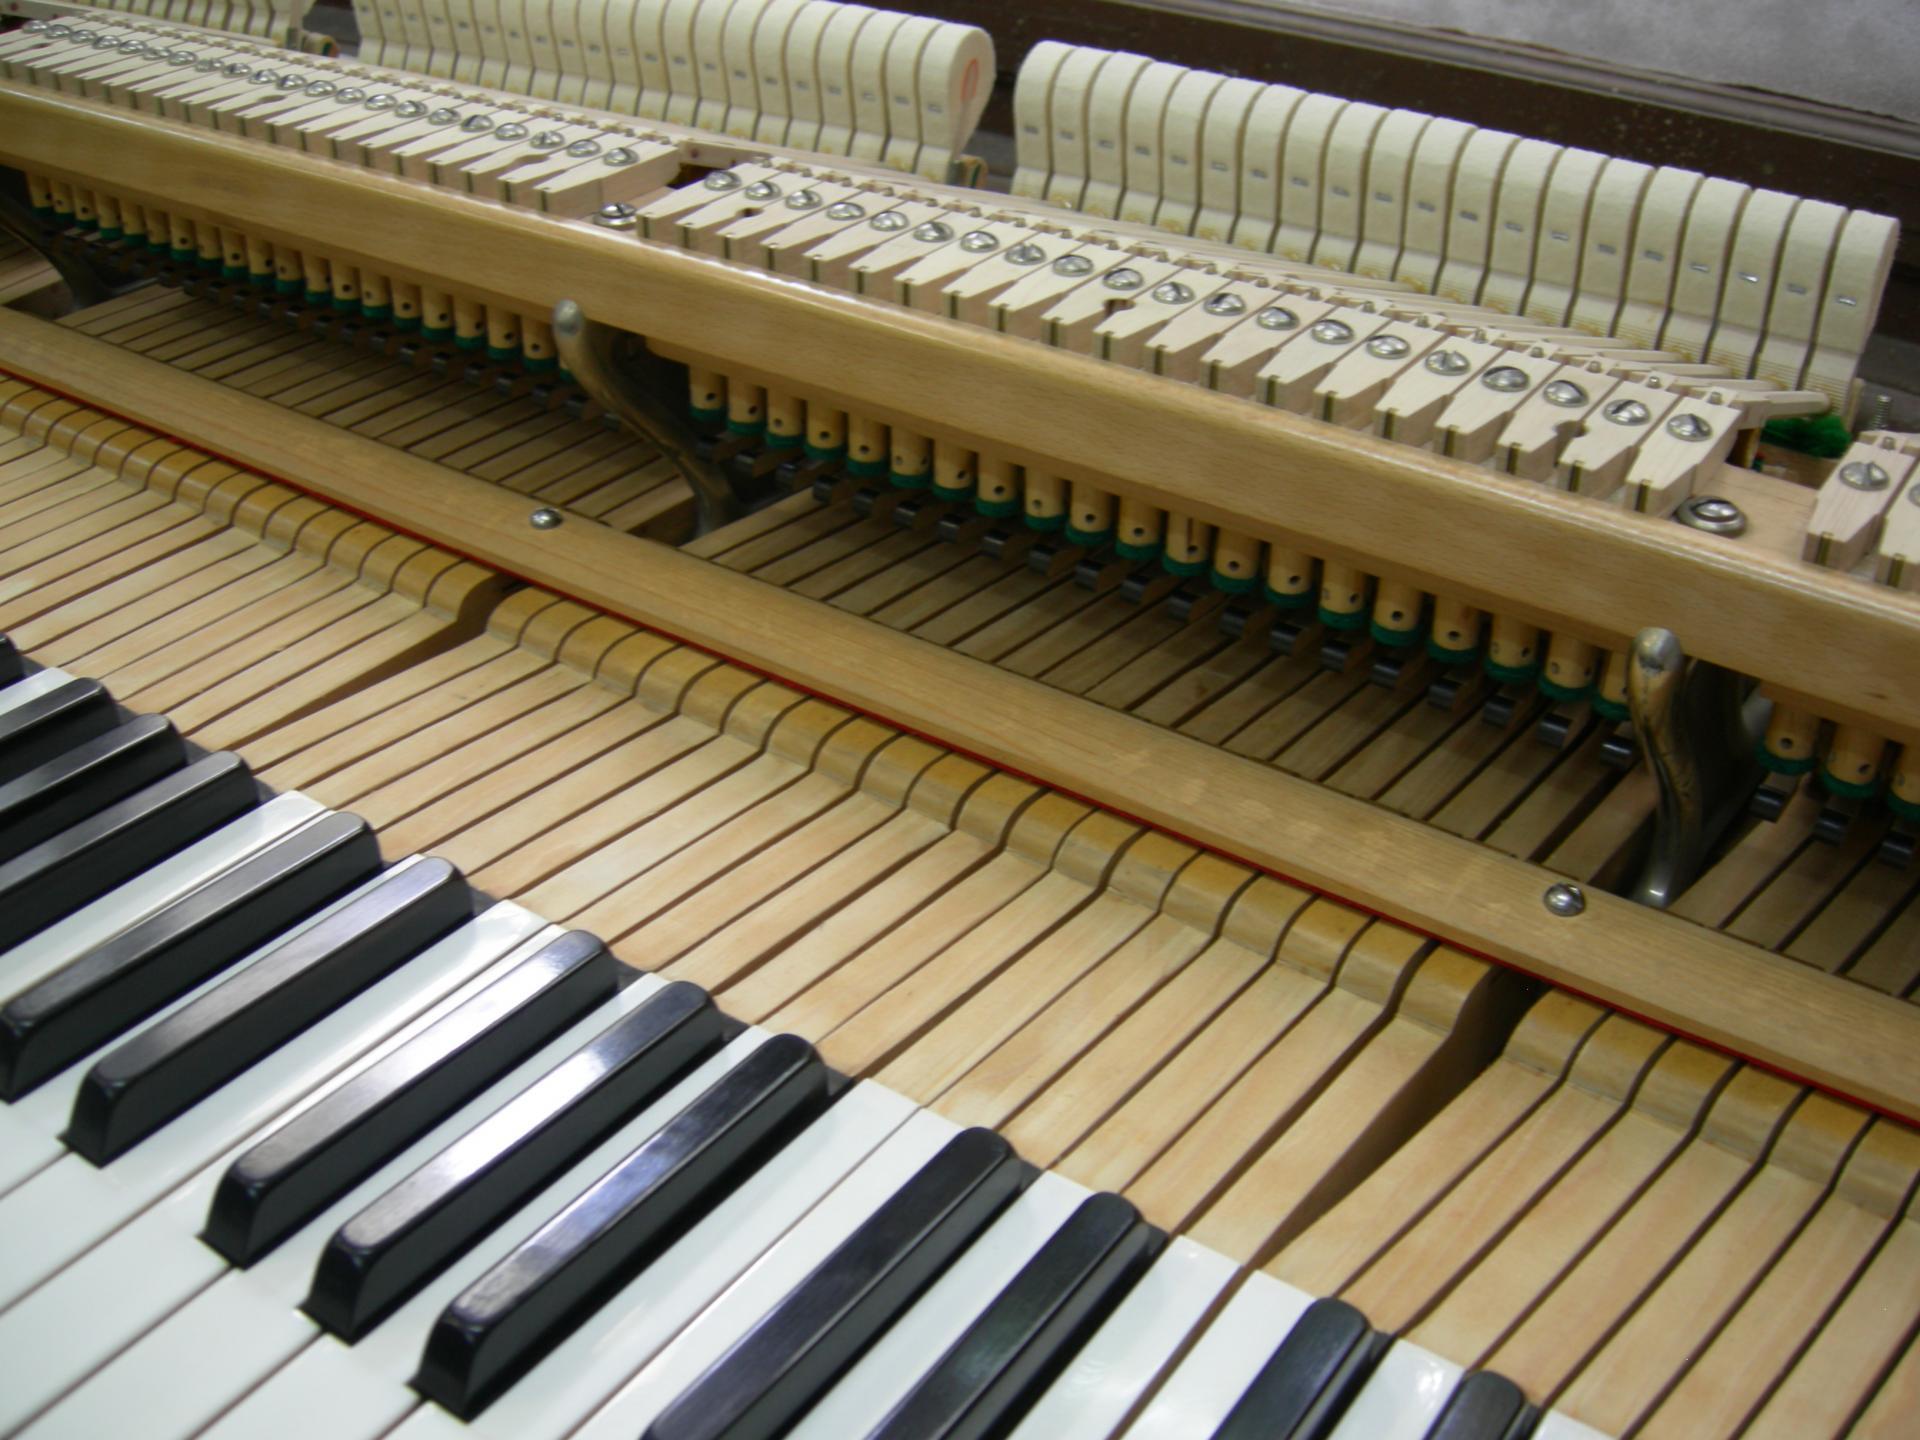 Bosendorfer clavier ap